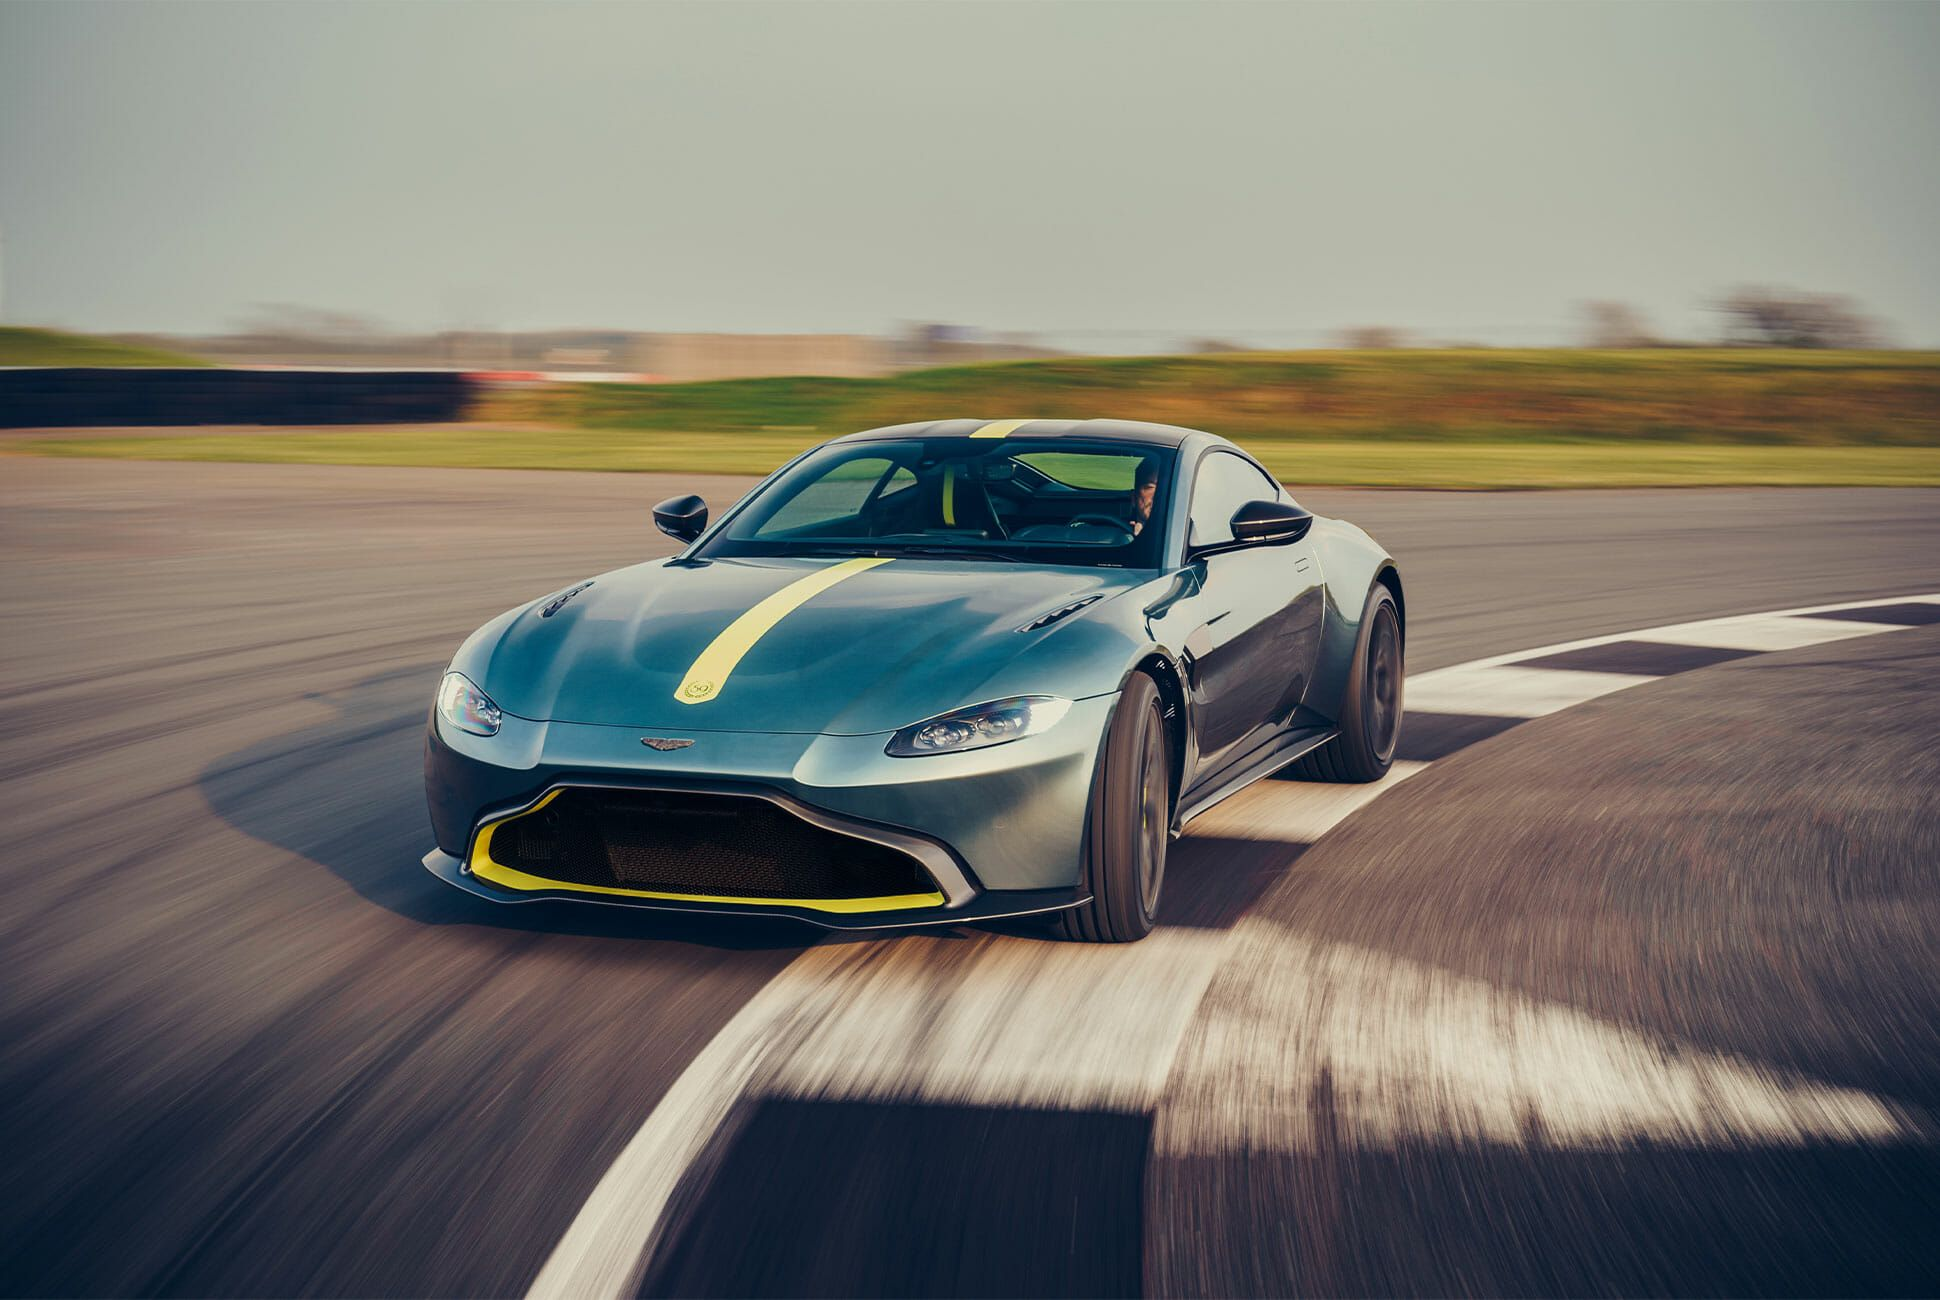 Aston-Martin-Vantage-AMR-Gear-Patrol-slide-1